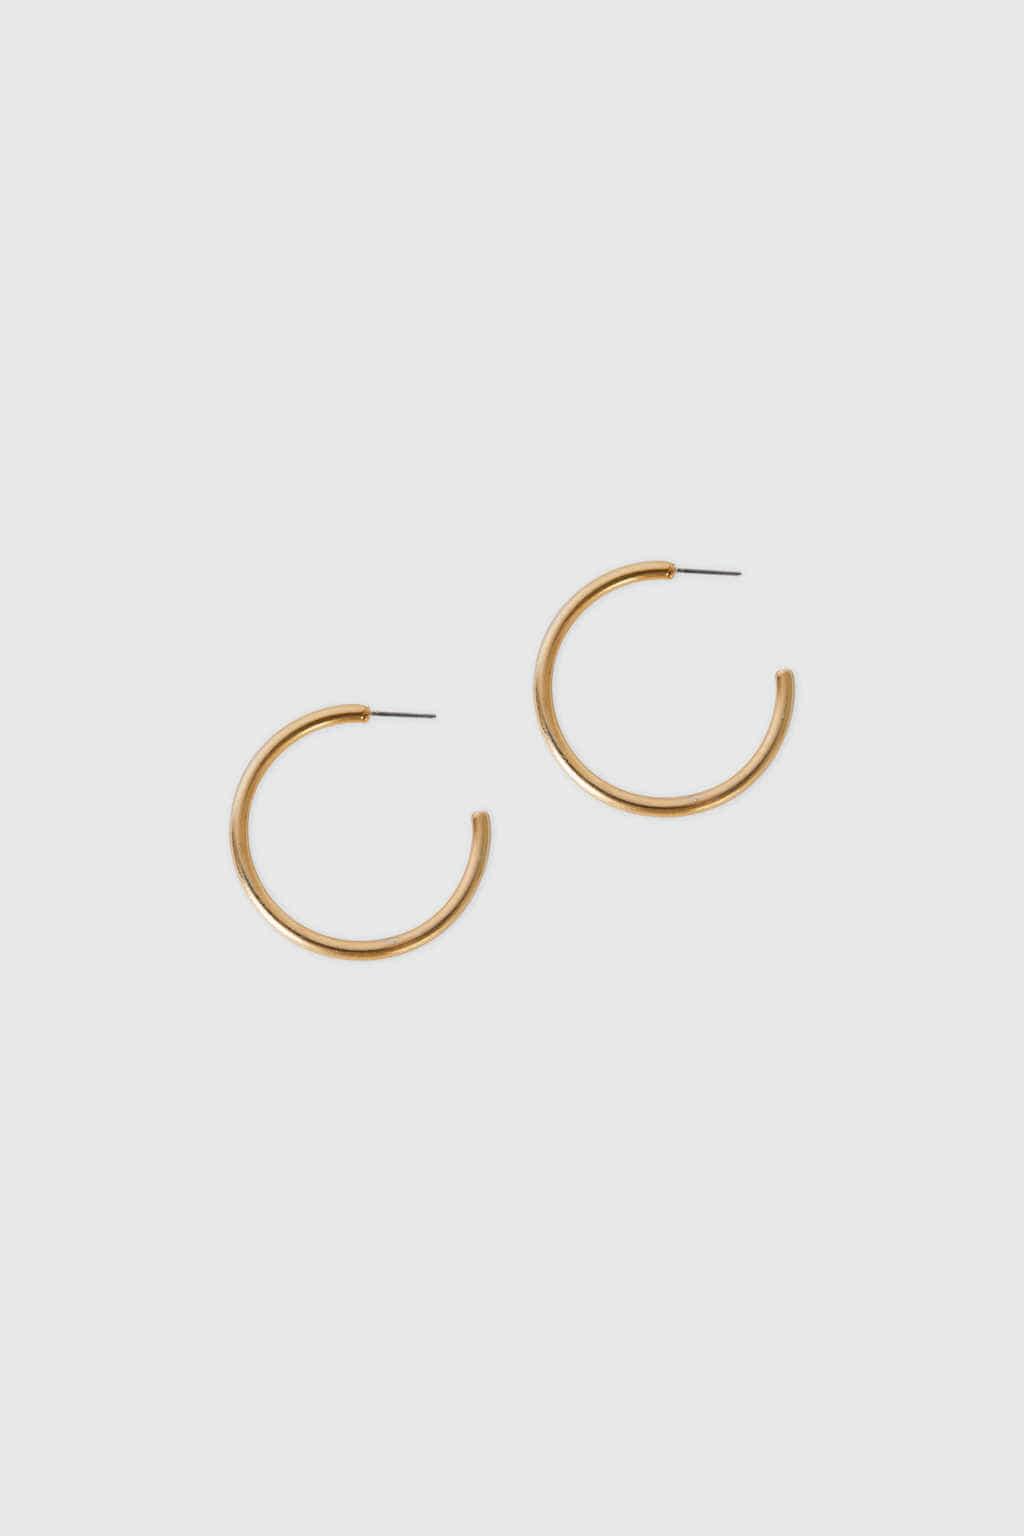 Earring J018 Gold 1